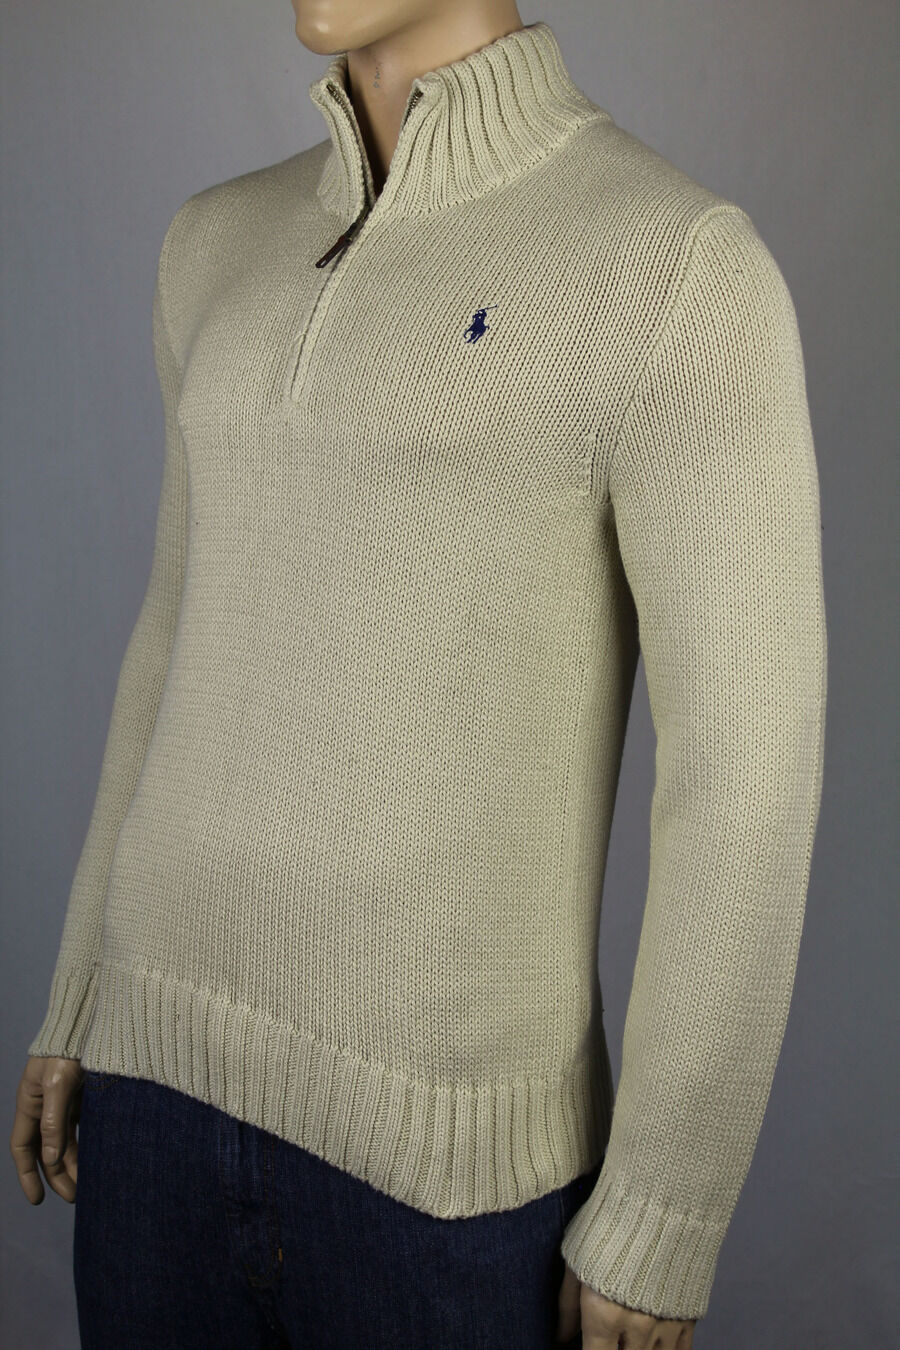 Polo Ralph Lauren Small S Cream Half 1/2 Half Cream Zip Sweater blu Pony NWT 3e1125